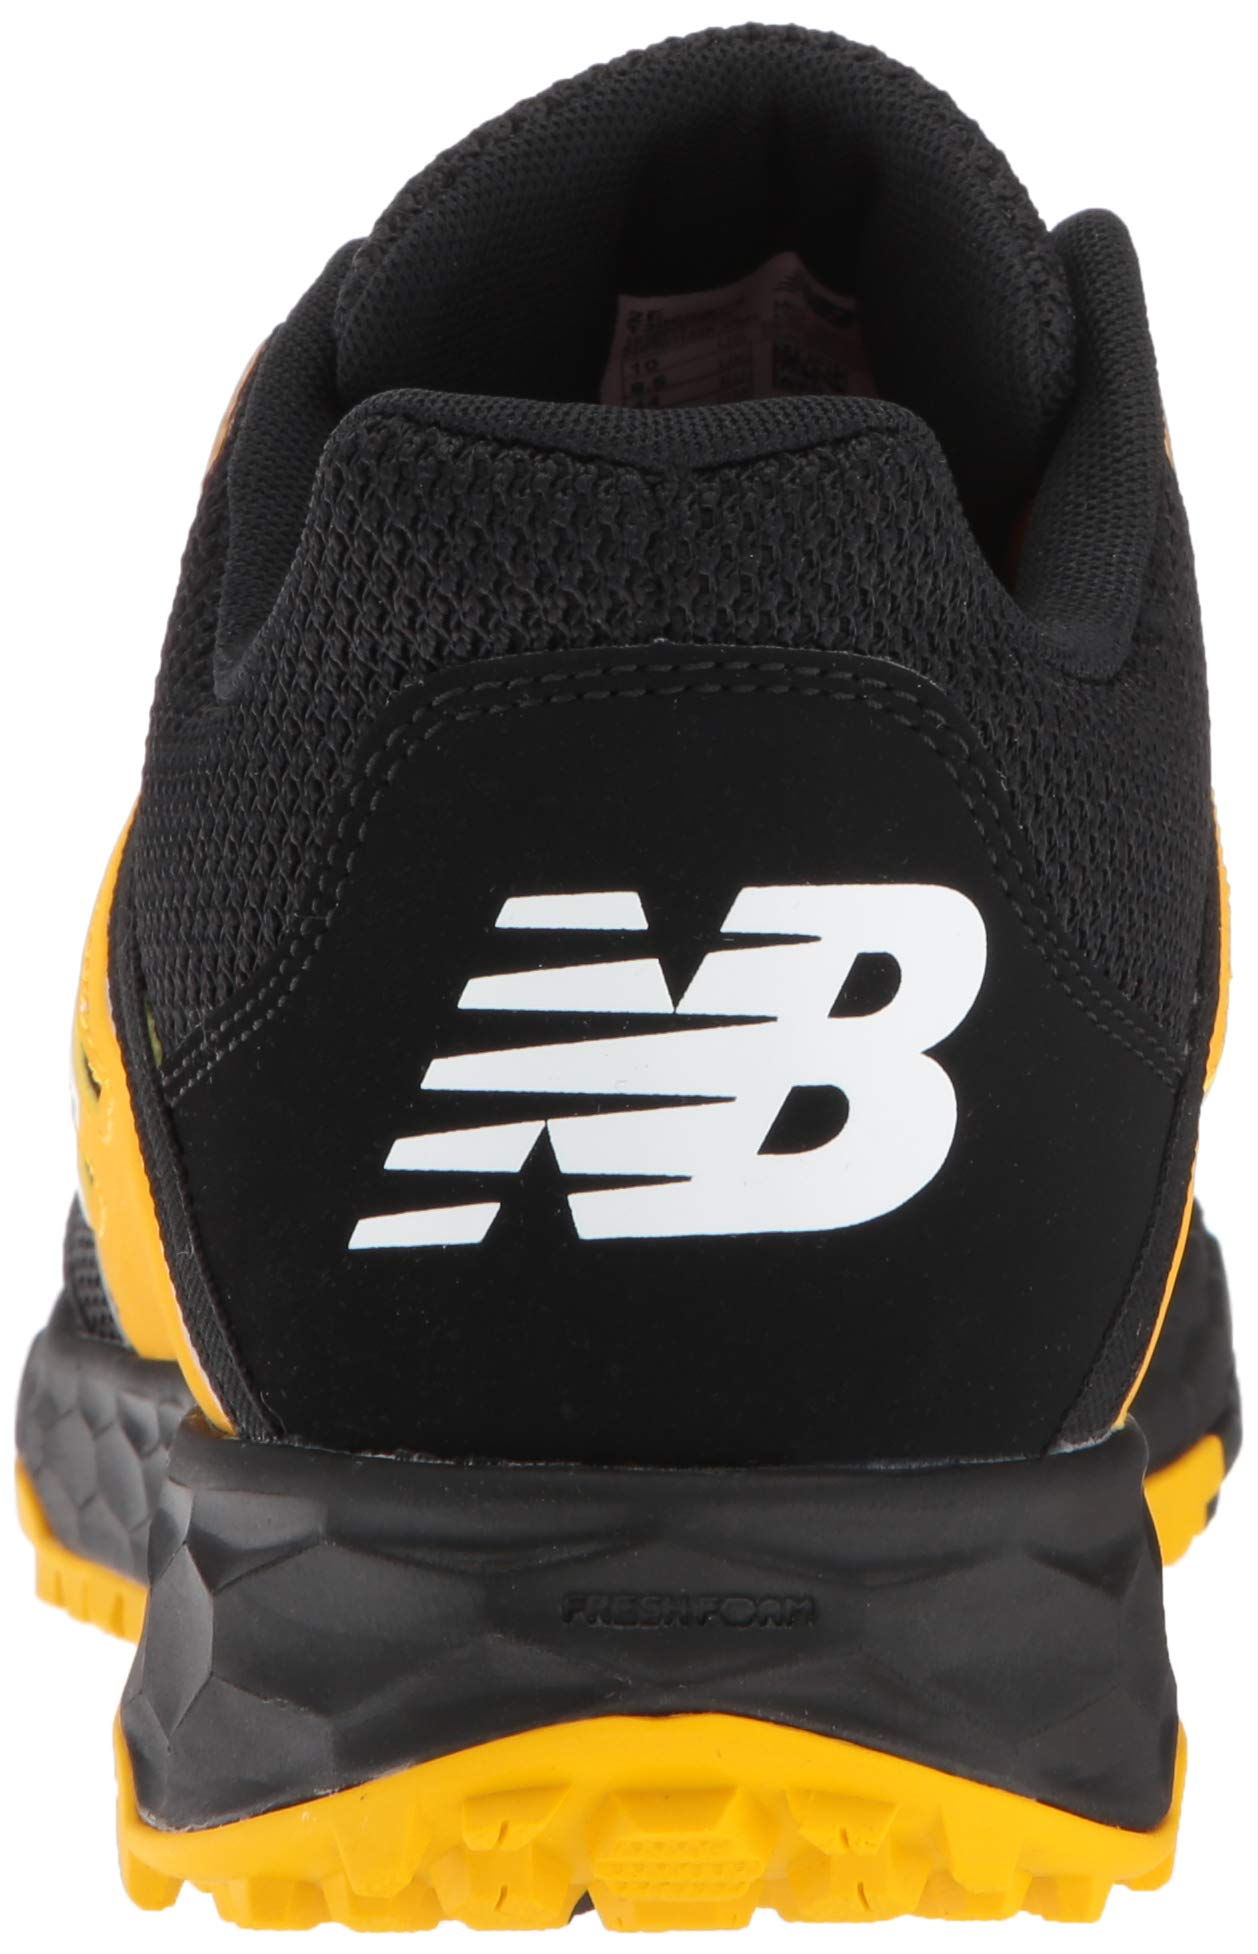 New Balance Men's 3000v4 Turf Baseball Shoe, Black/Yellow, 5 D US by New Balance (Image #2)